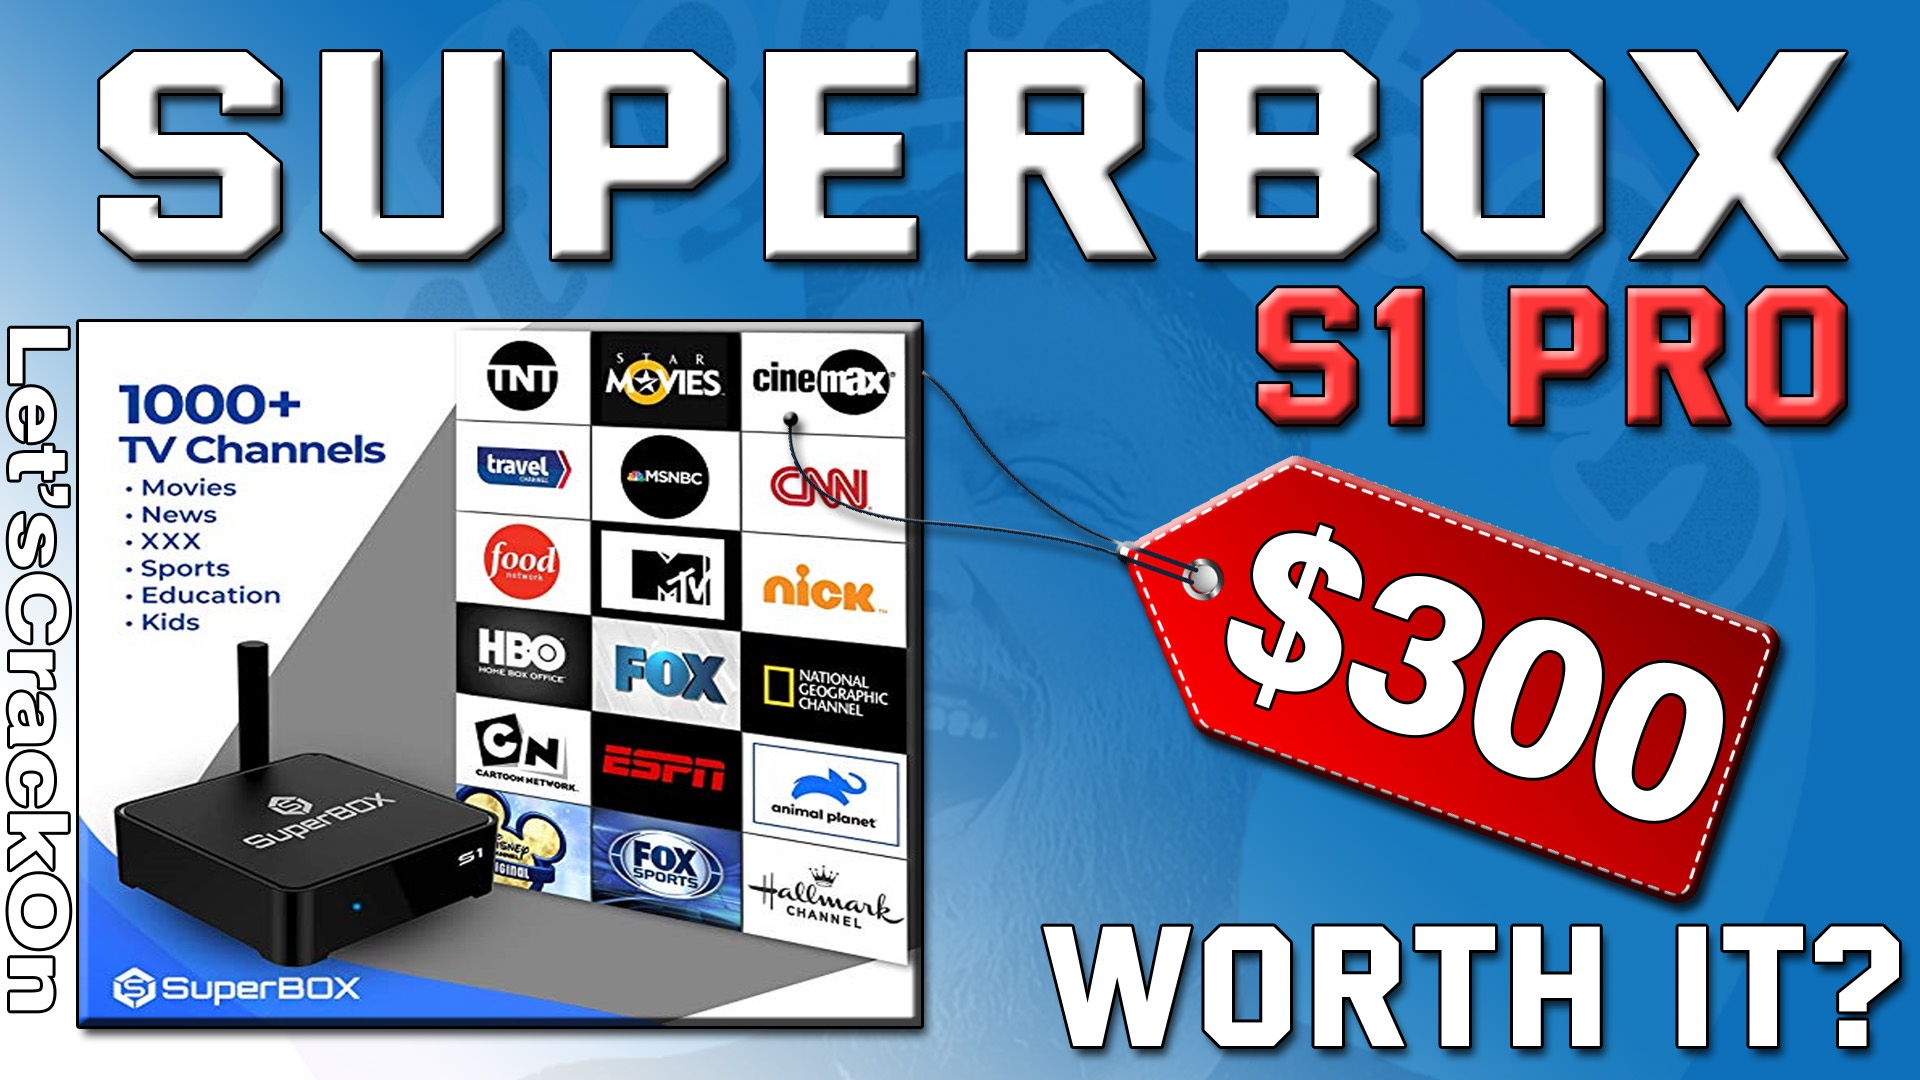 Superbox S1 Pro